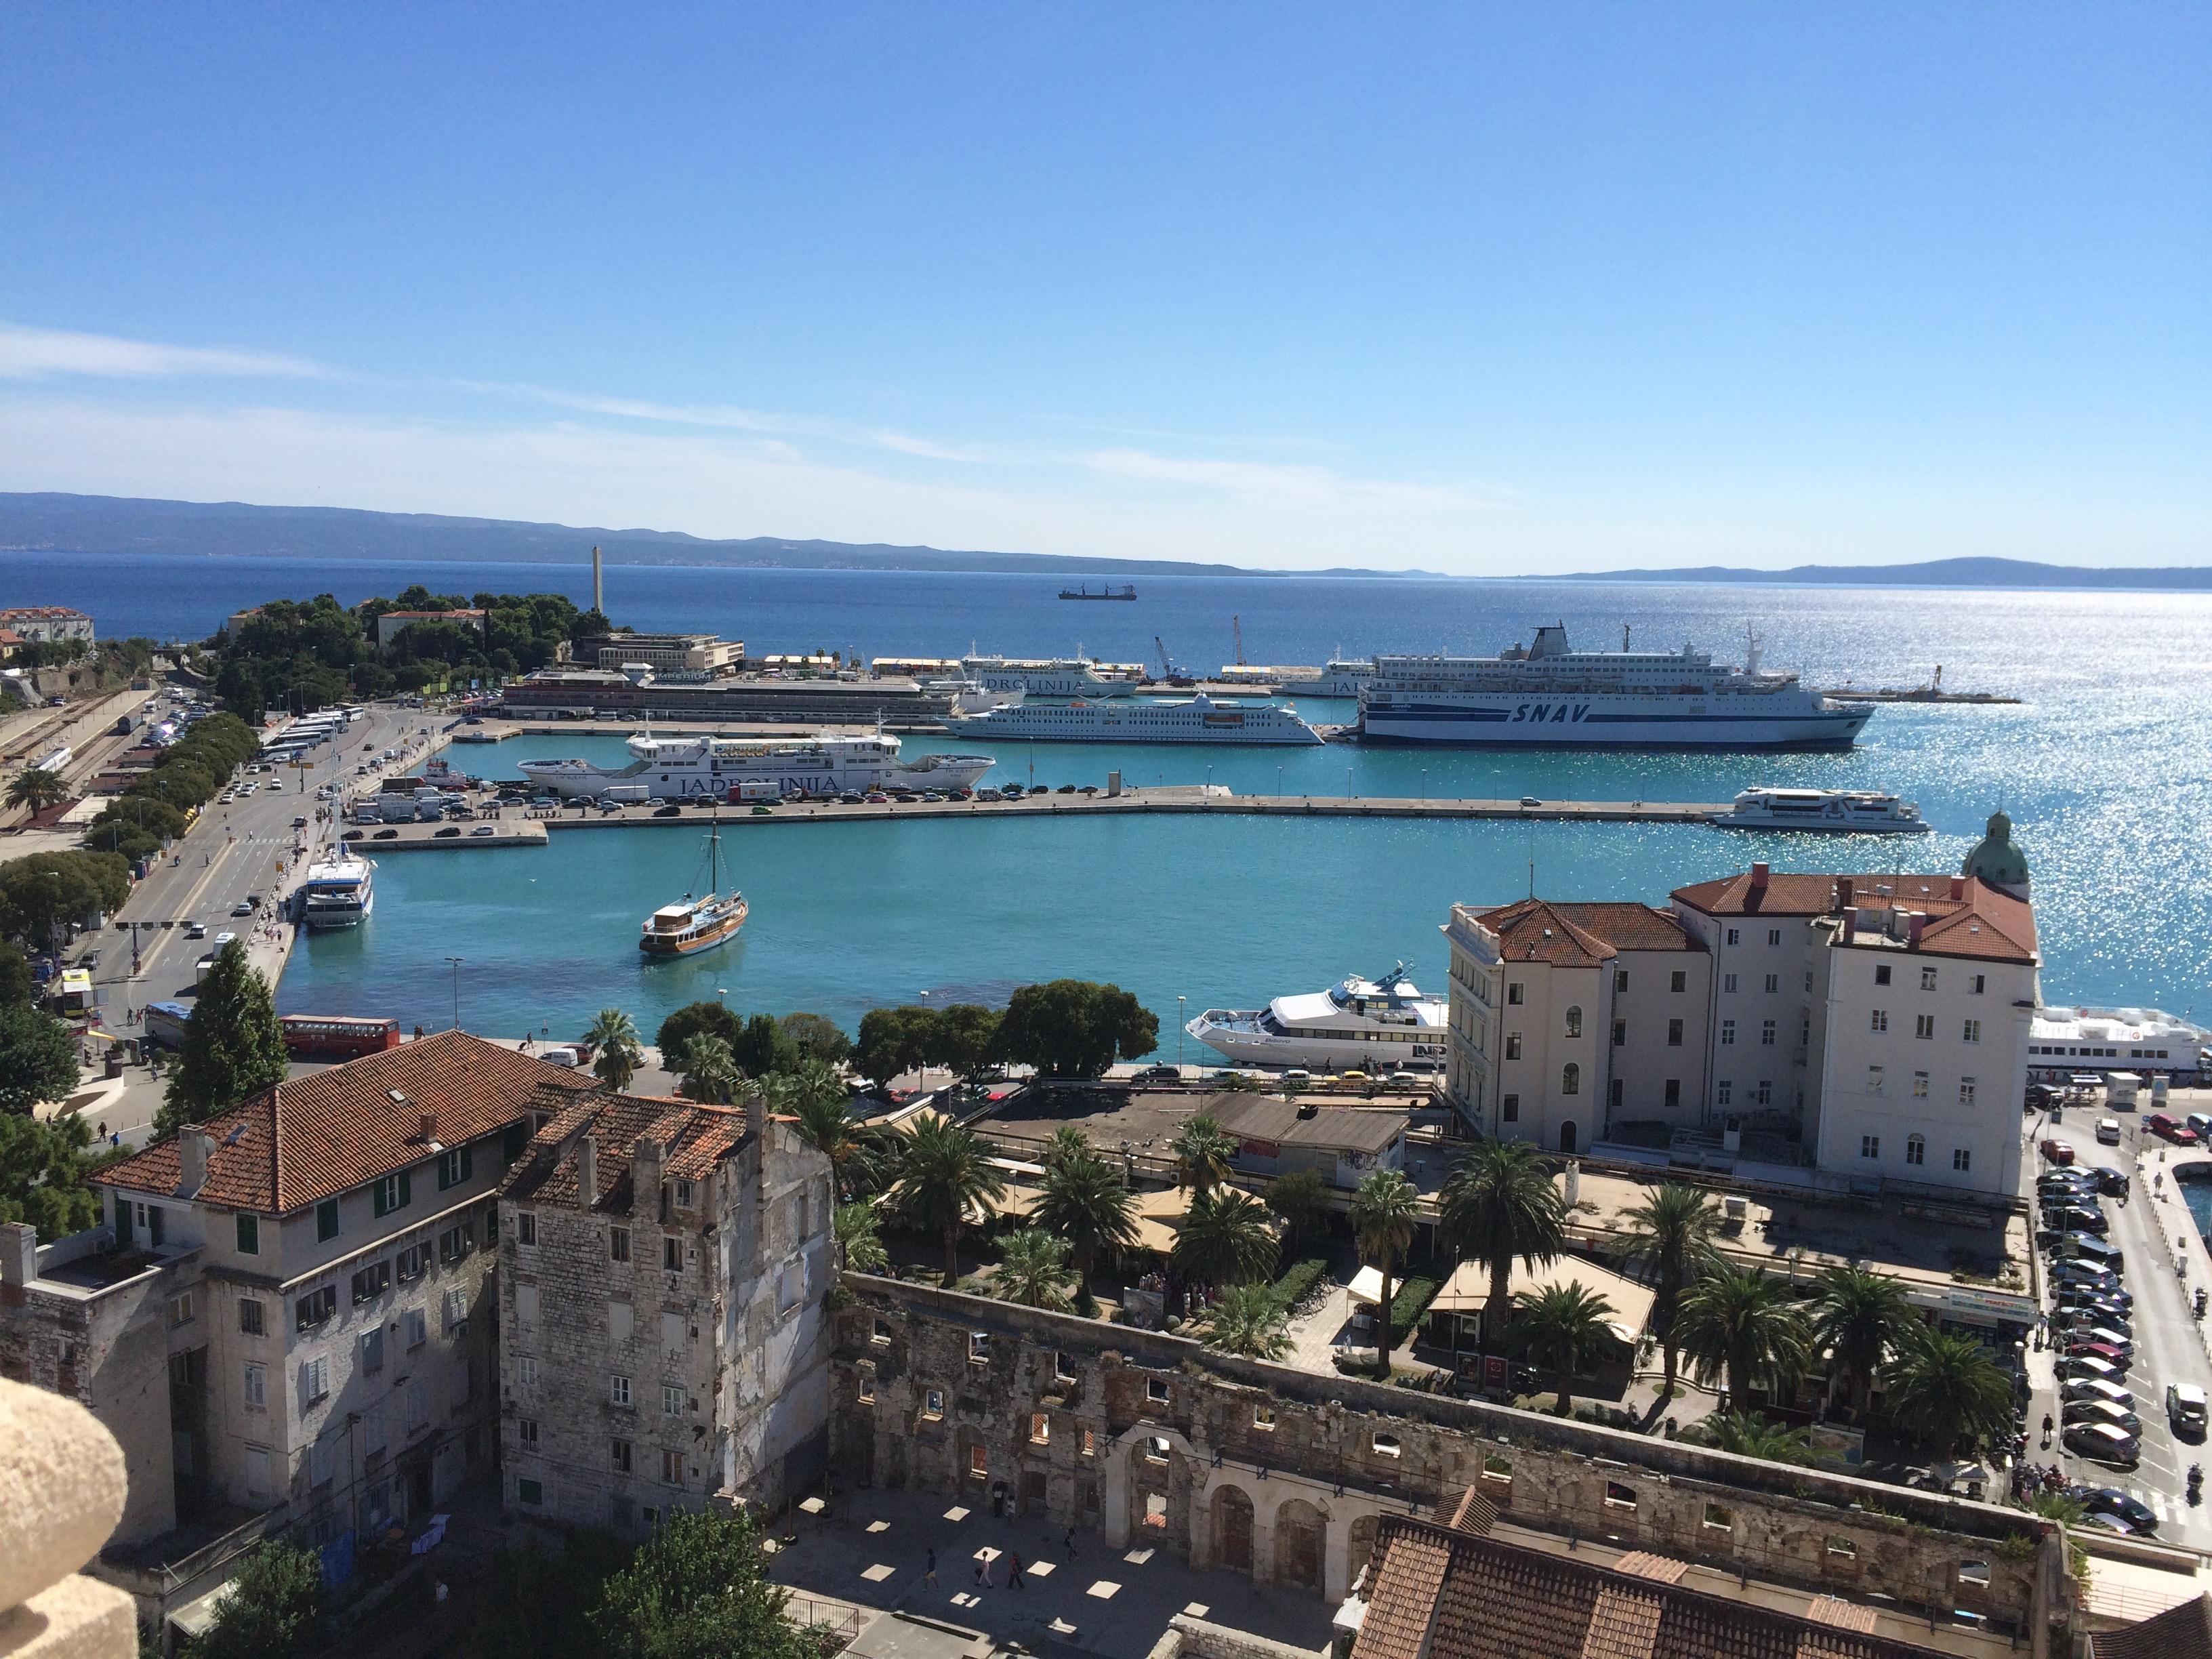 Split ferry terminal, Croatia - cultivatedrambler.com